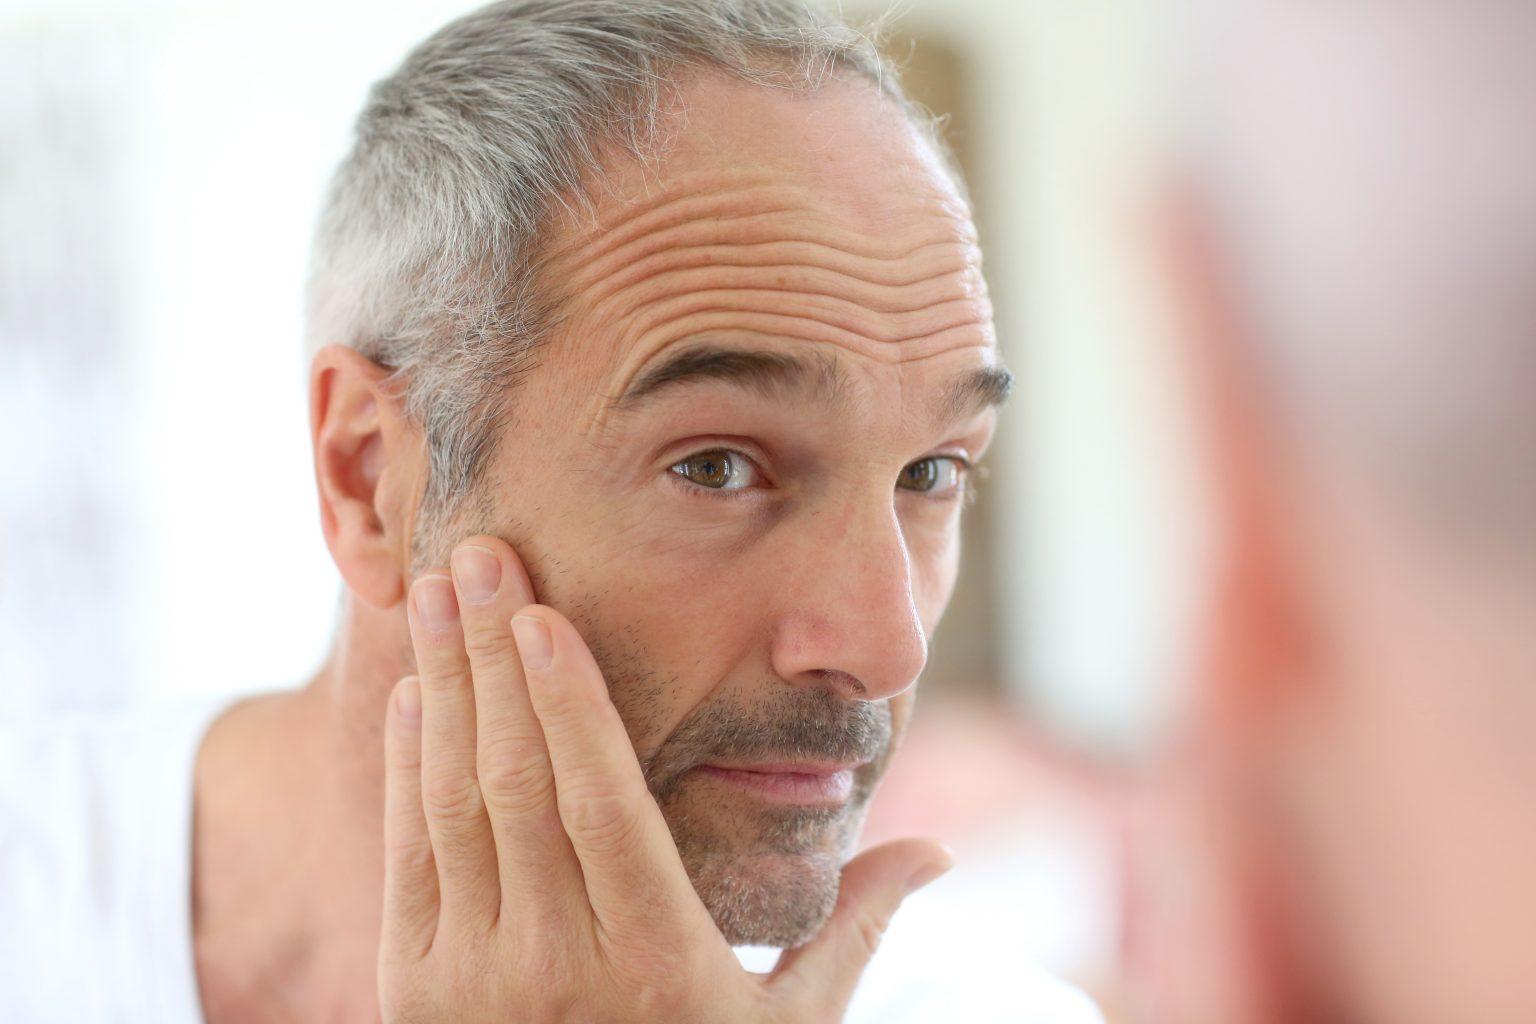 Skin treatments for men